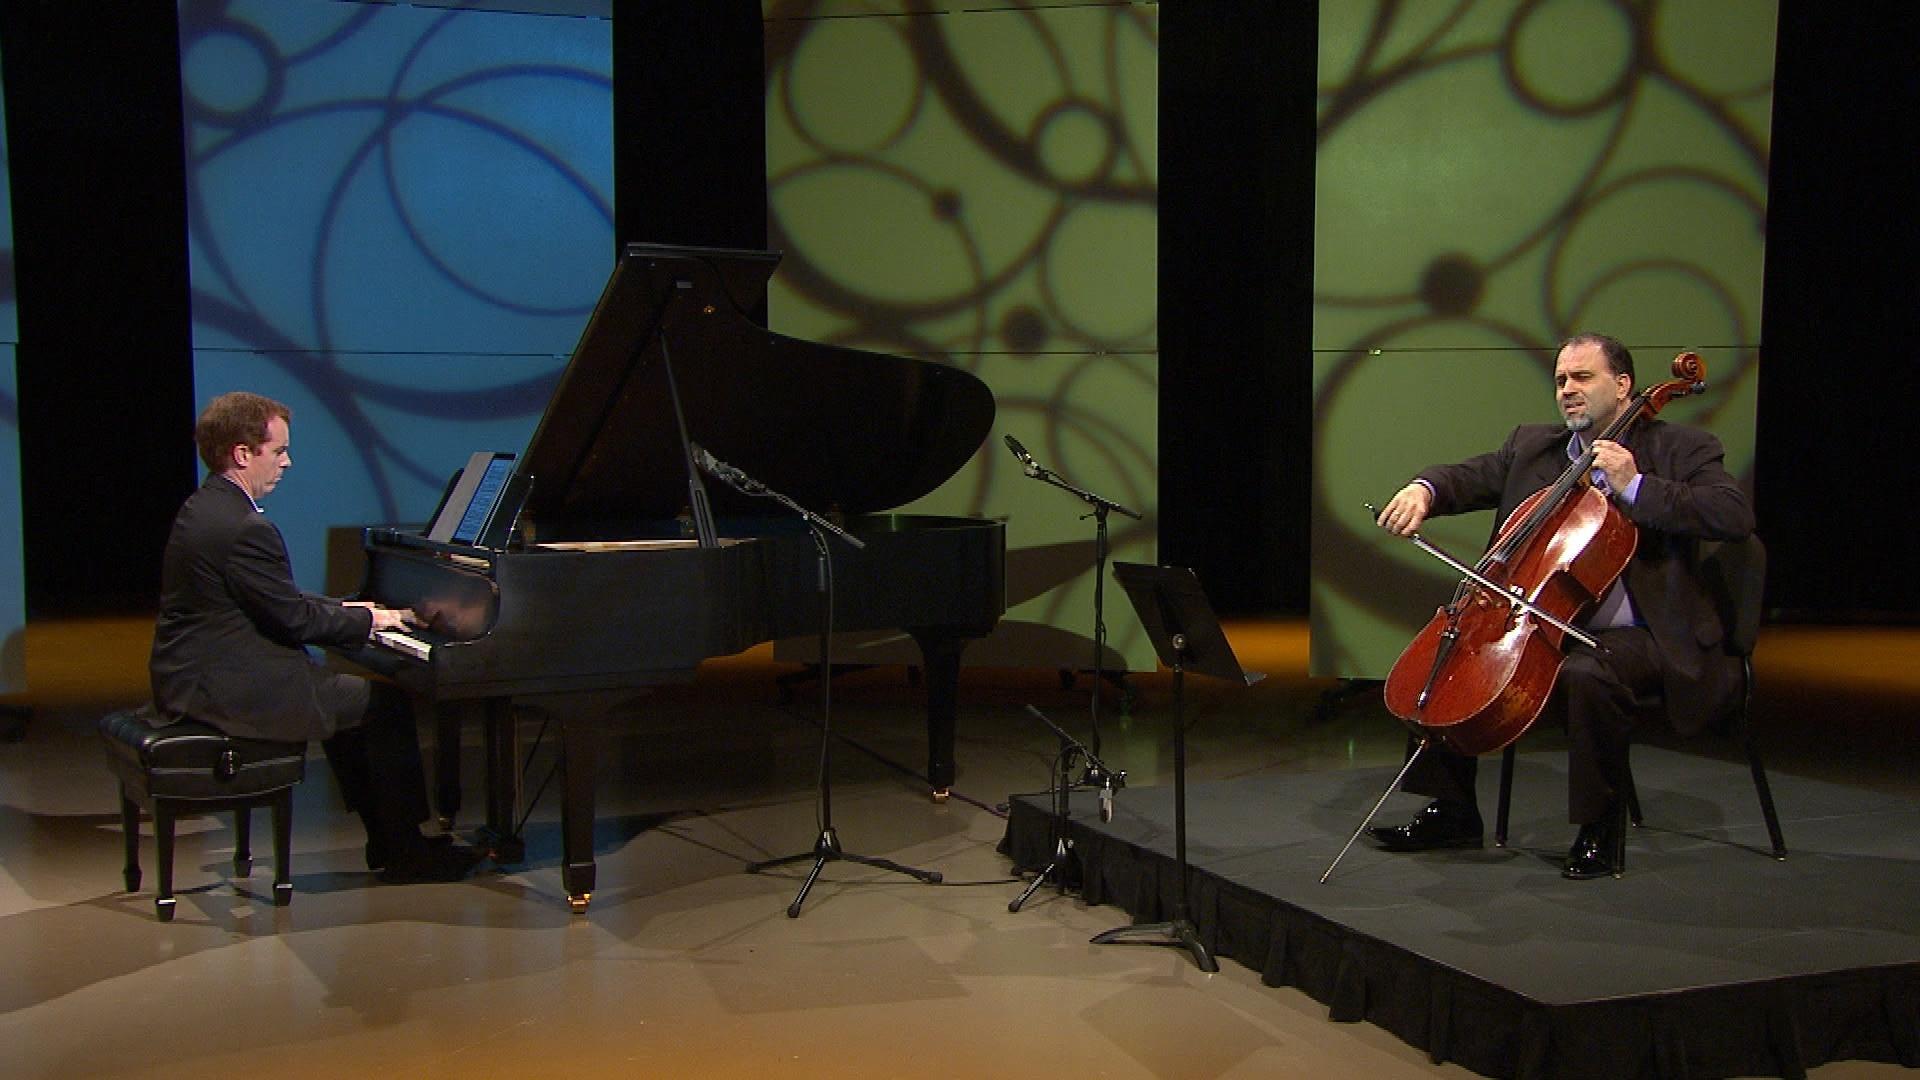 BPO musicians Eric Huebner, Piano and Roman Mekinulov, Principal Cellist